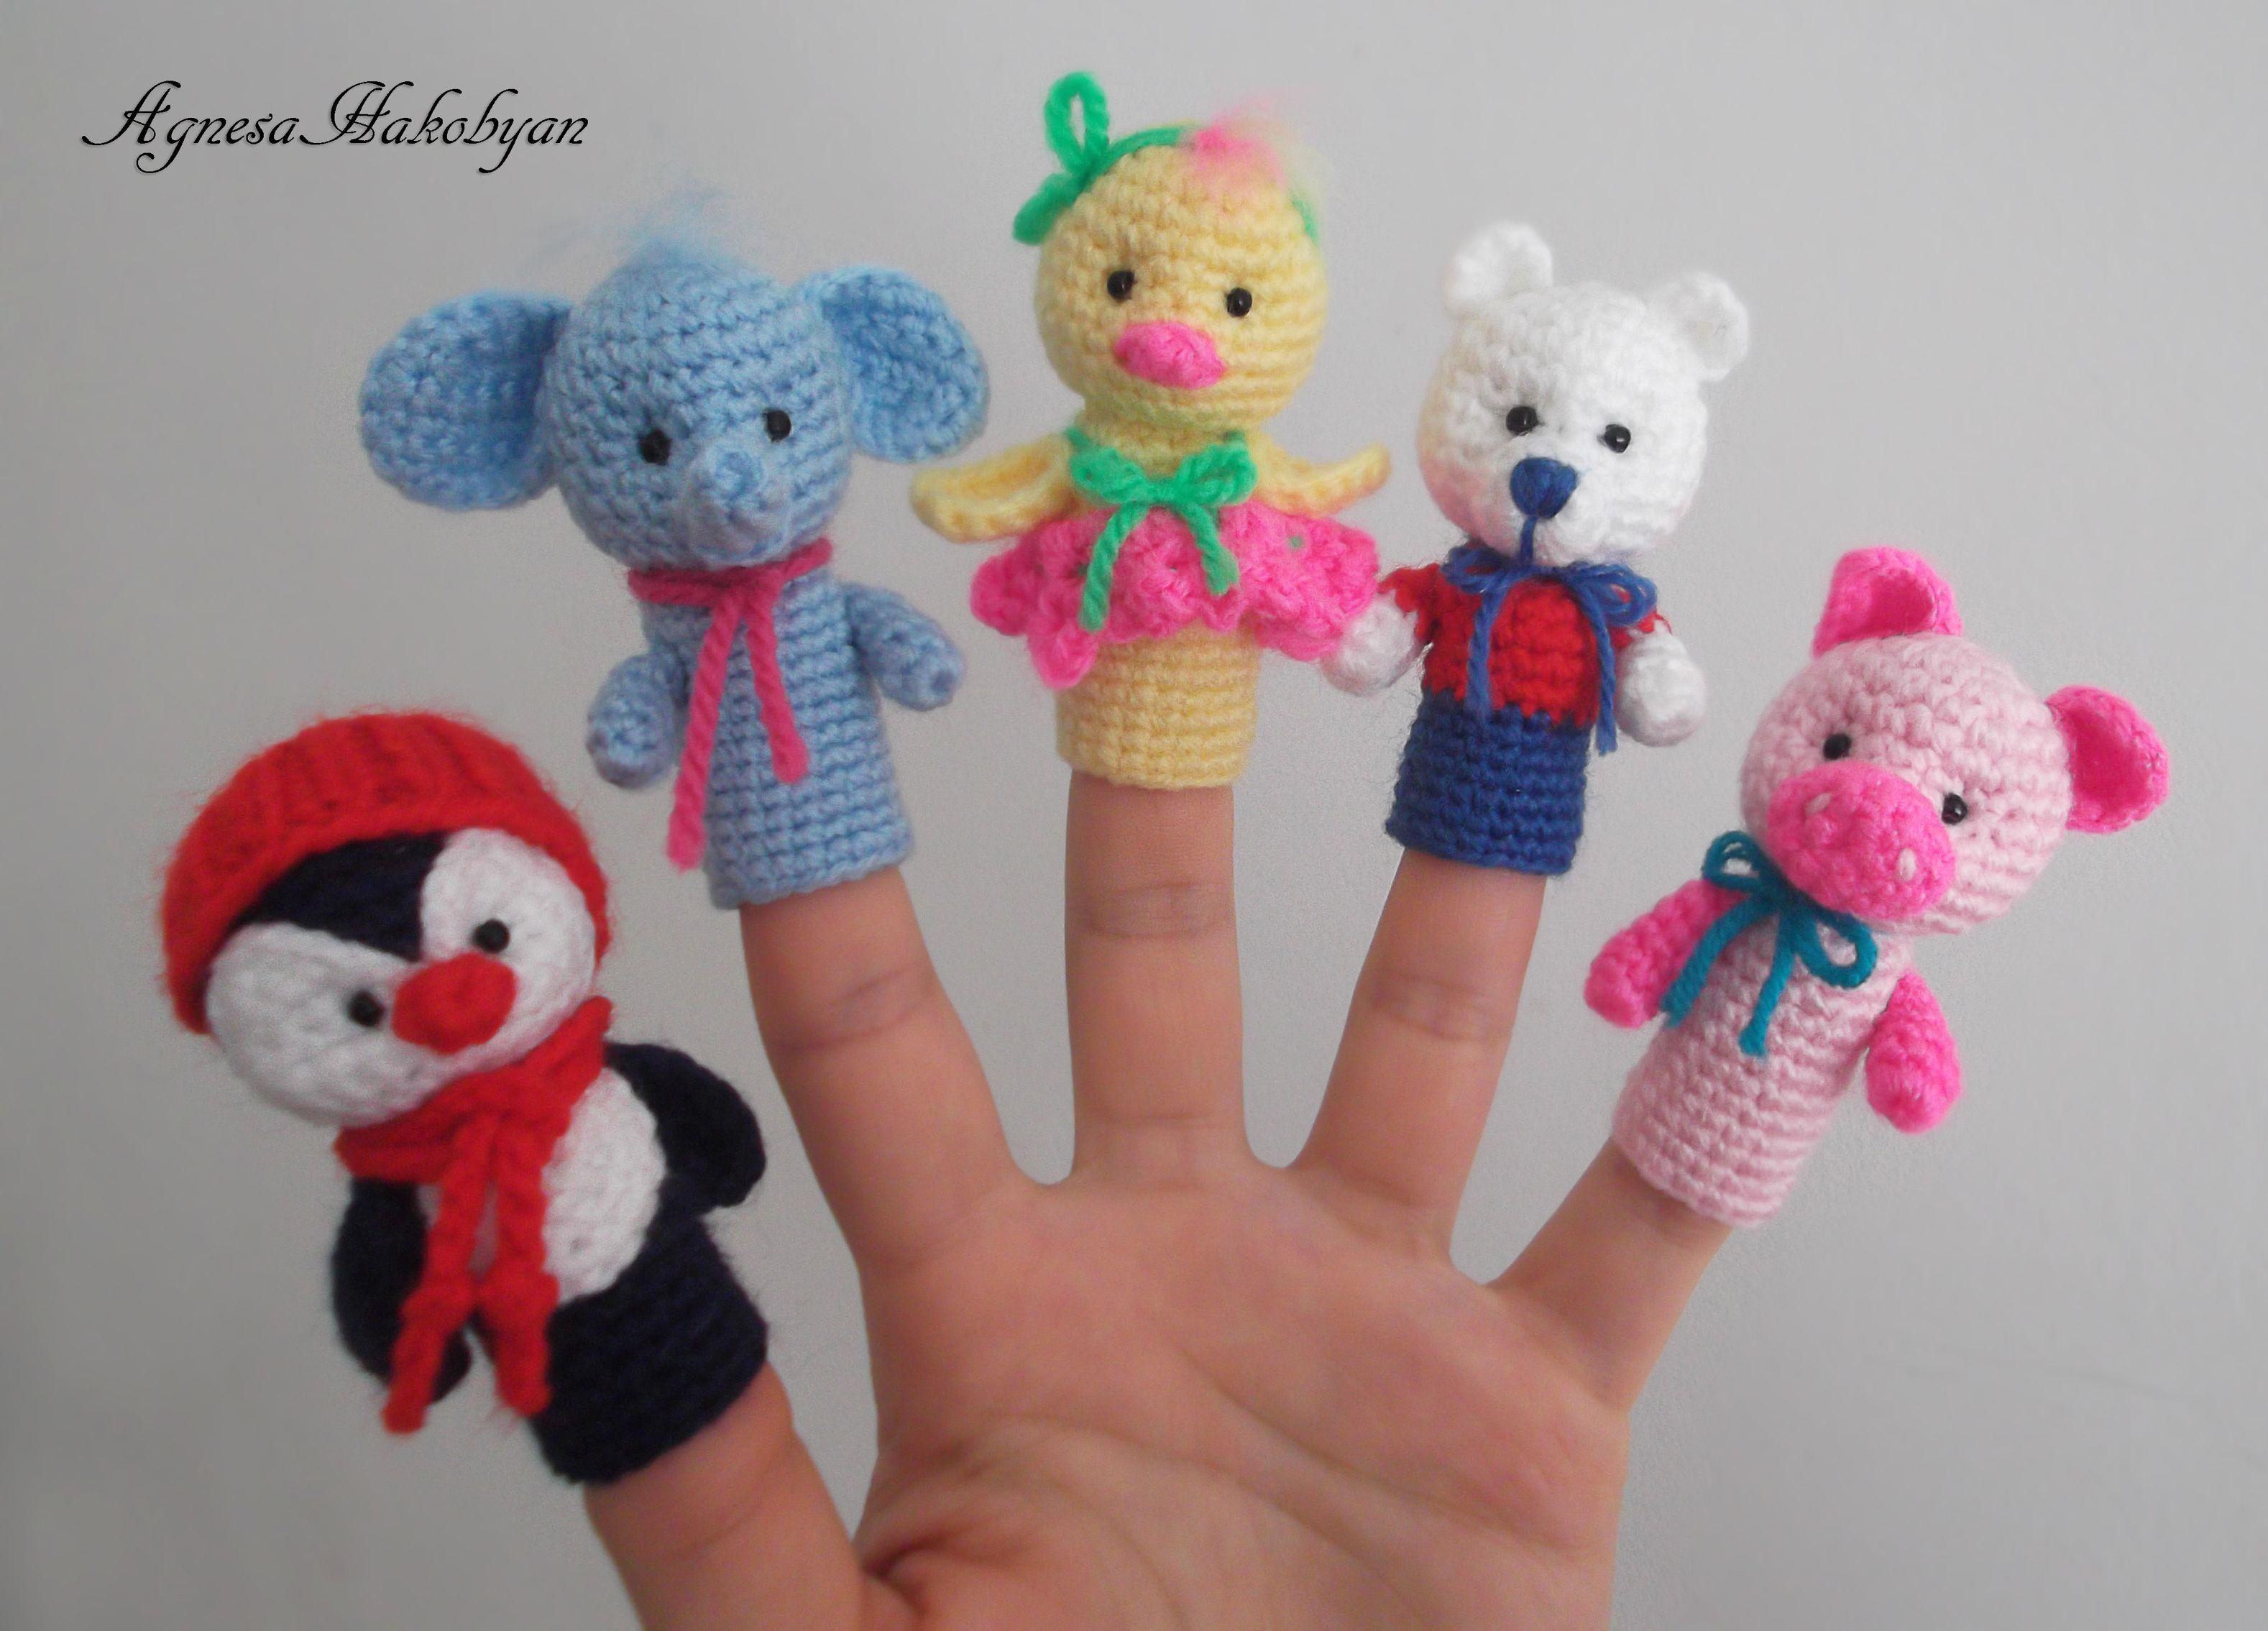 Pin de Karen Cardoza en Crochet | Pinterest | Conejo, Nena y Textiles